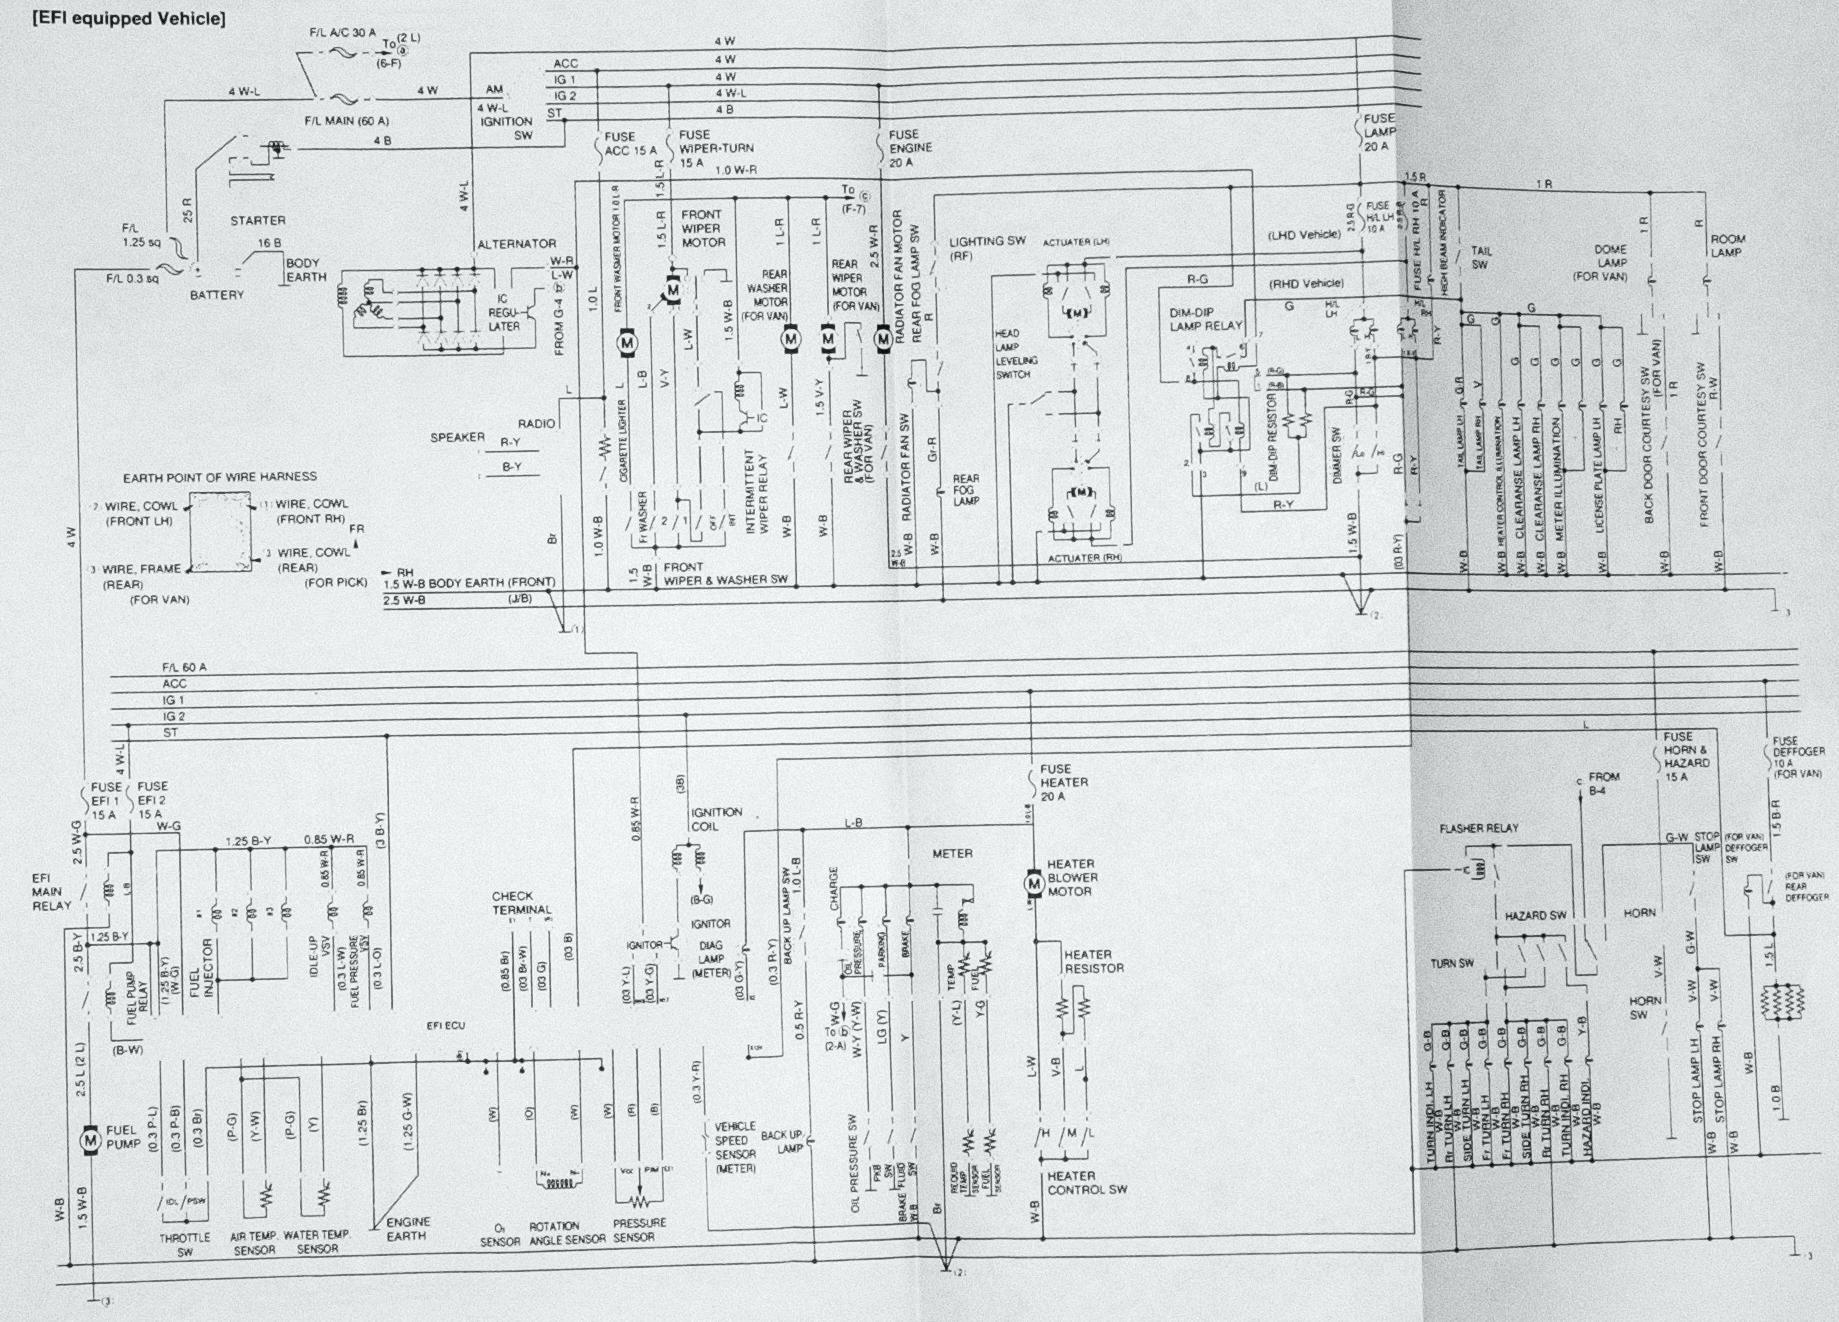 subaru sambar mini truck wiring diagram wiring diagram database international truck wiring diagram mini truck wiring diagram all wiring diagram suzuki carry mini truck daihatsu truck wiring diagram wiring